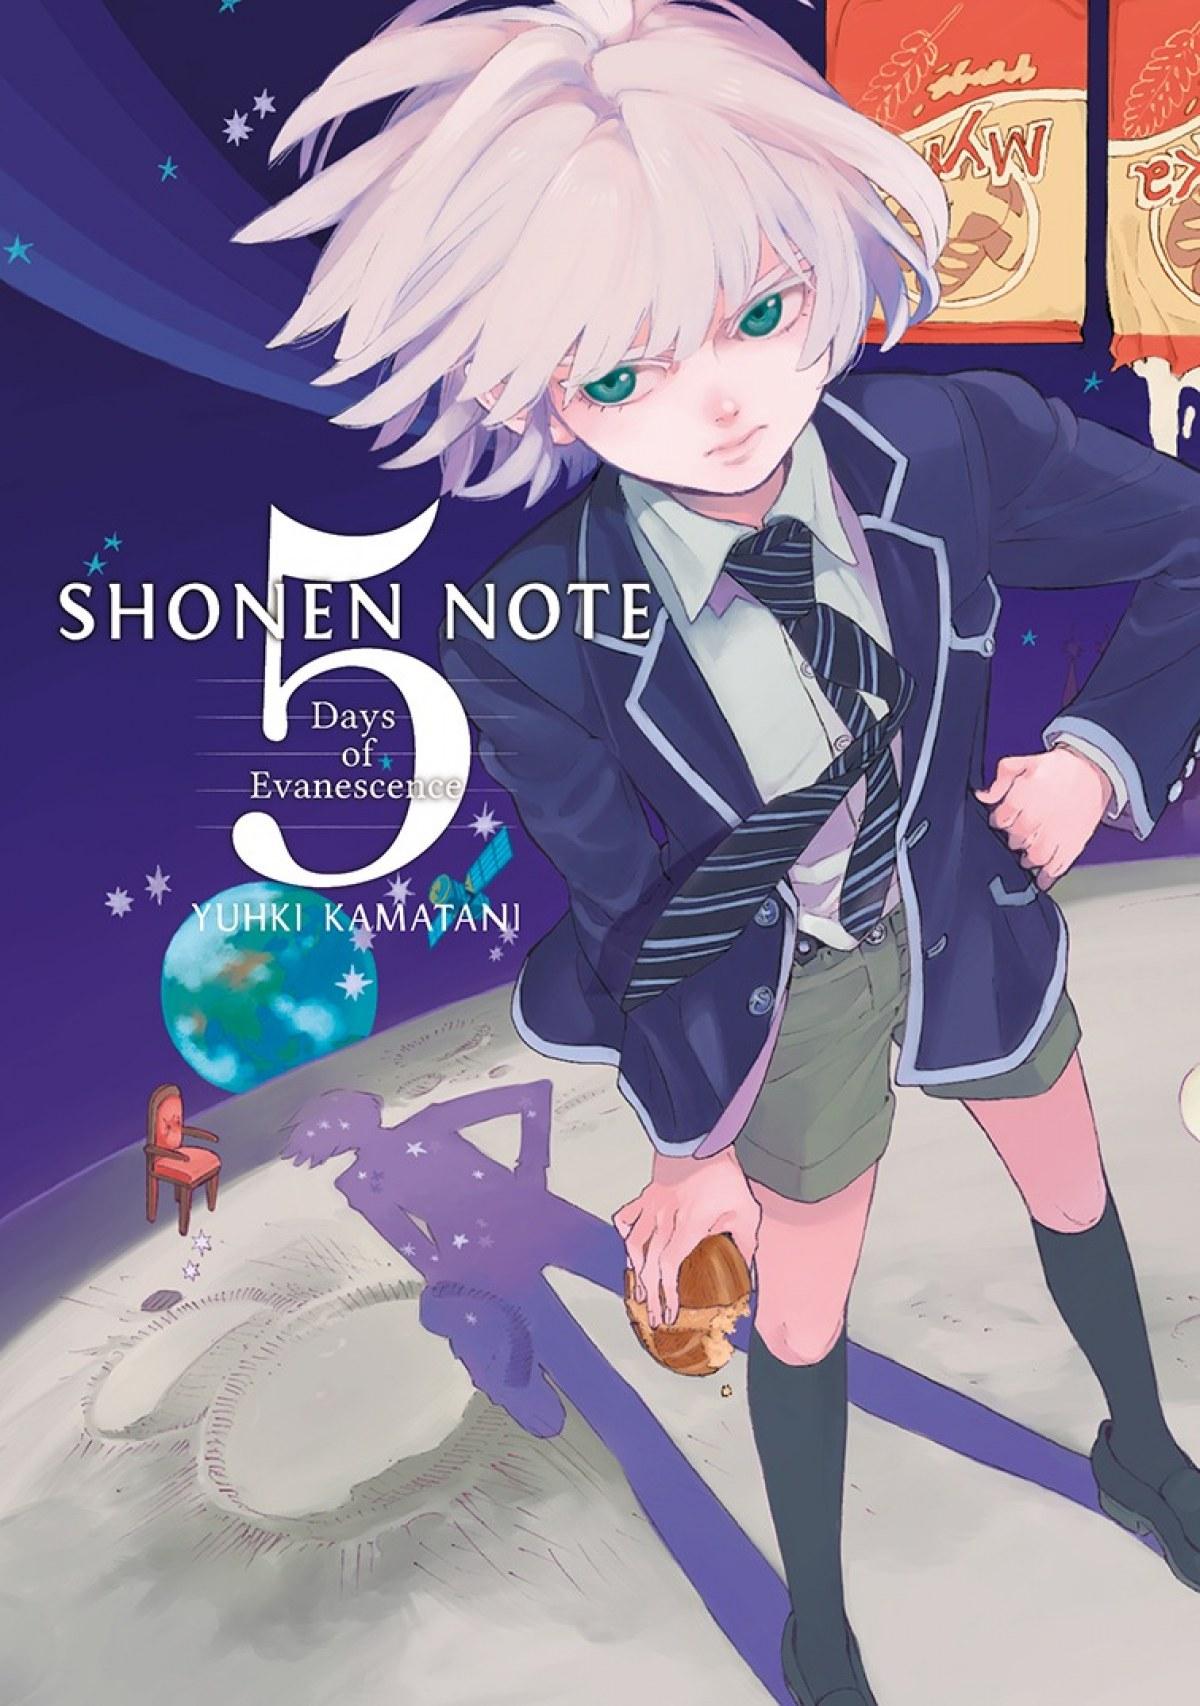 Shonen Note, vol. 5. Days of Evanescence